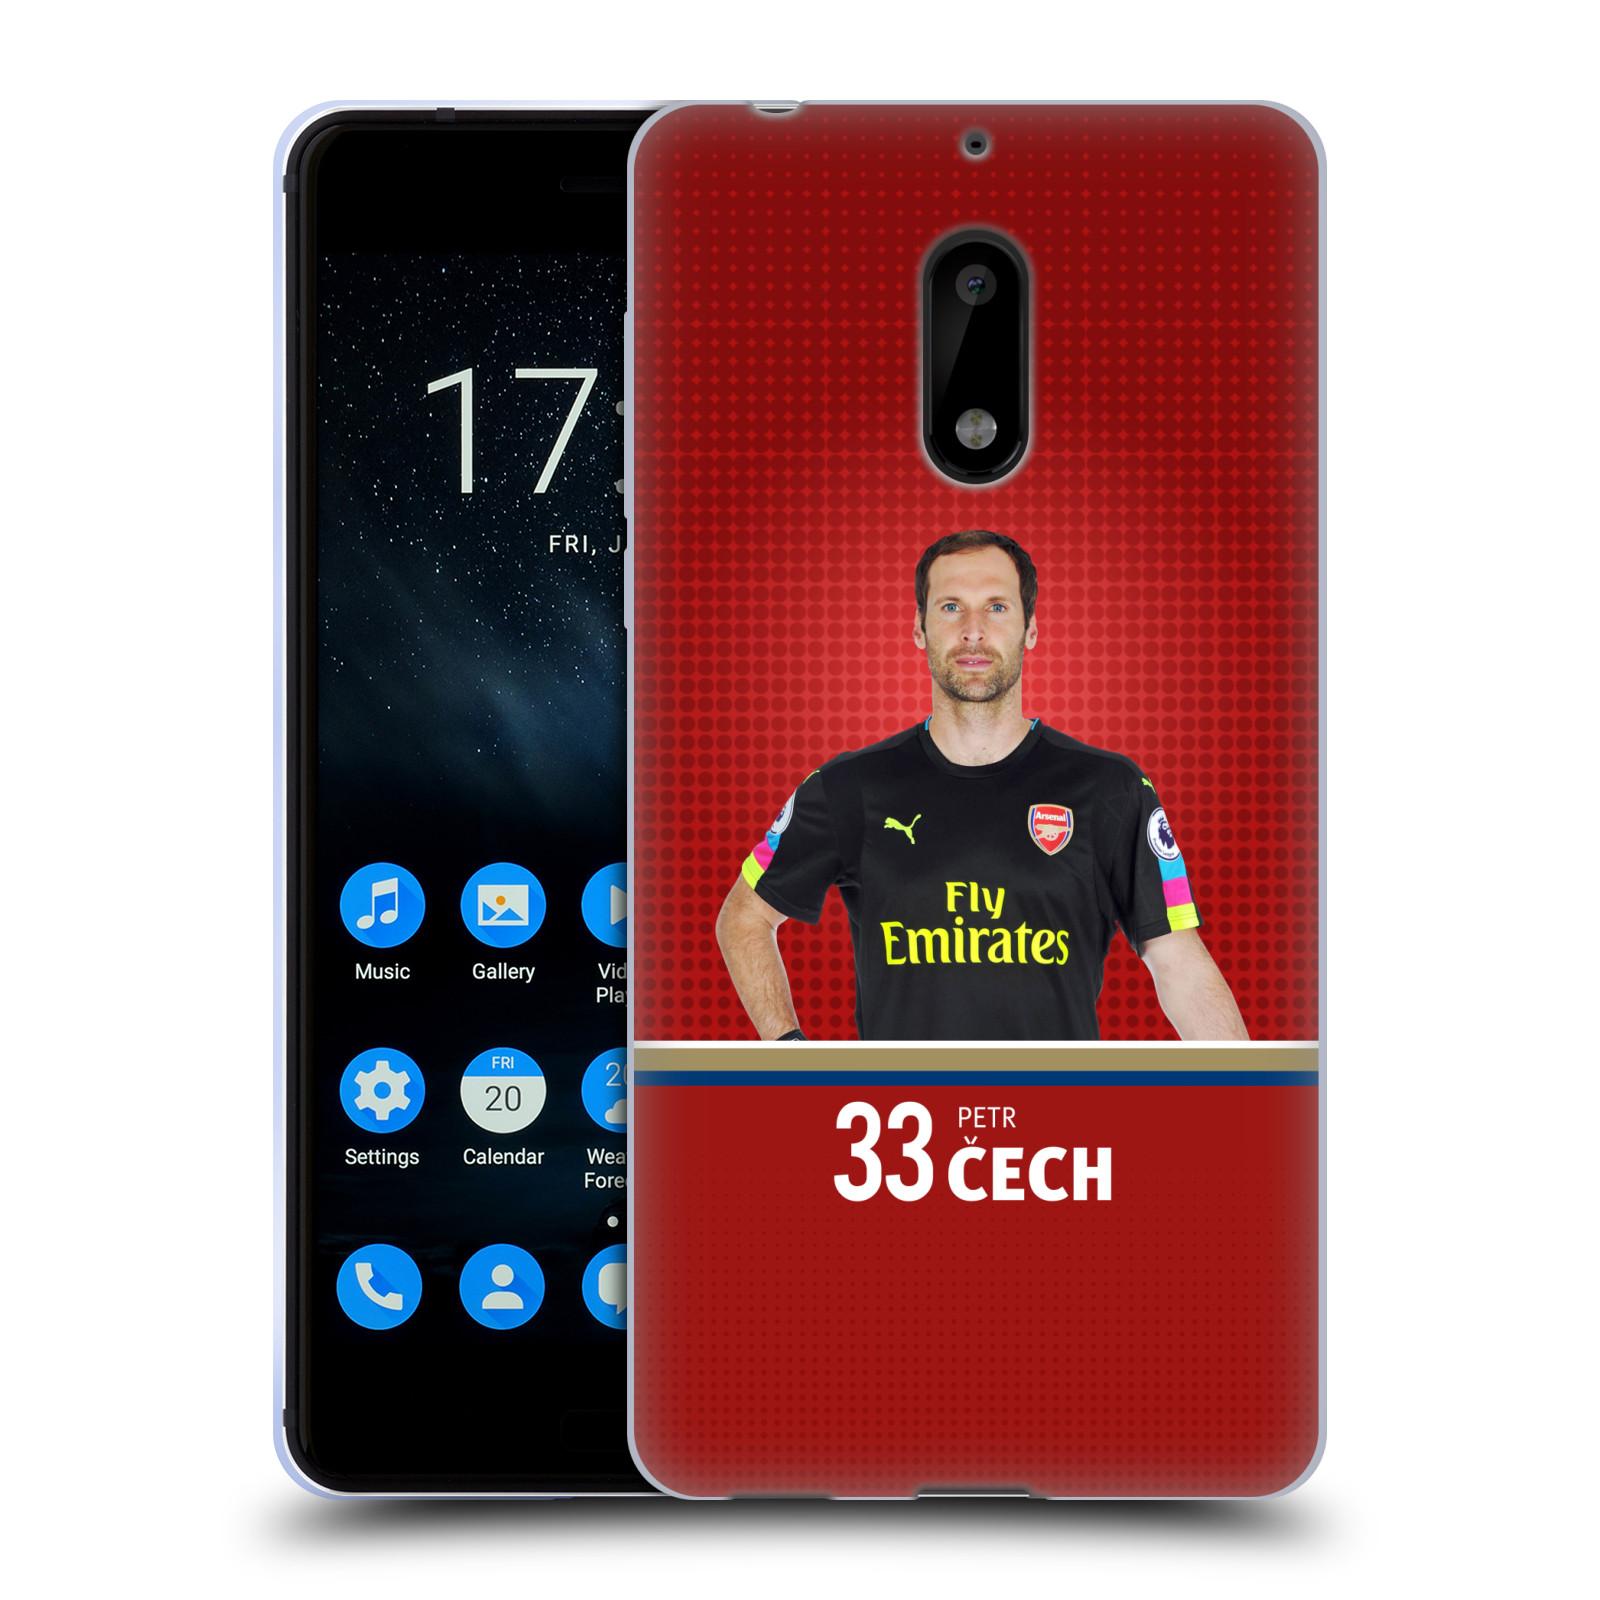 Silikonové pouzdro na mobil Nokia 6 - Head Case - Arsenal FC - Petr Čech